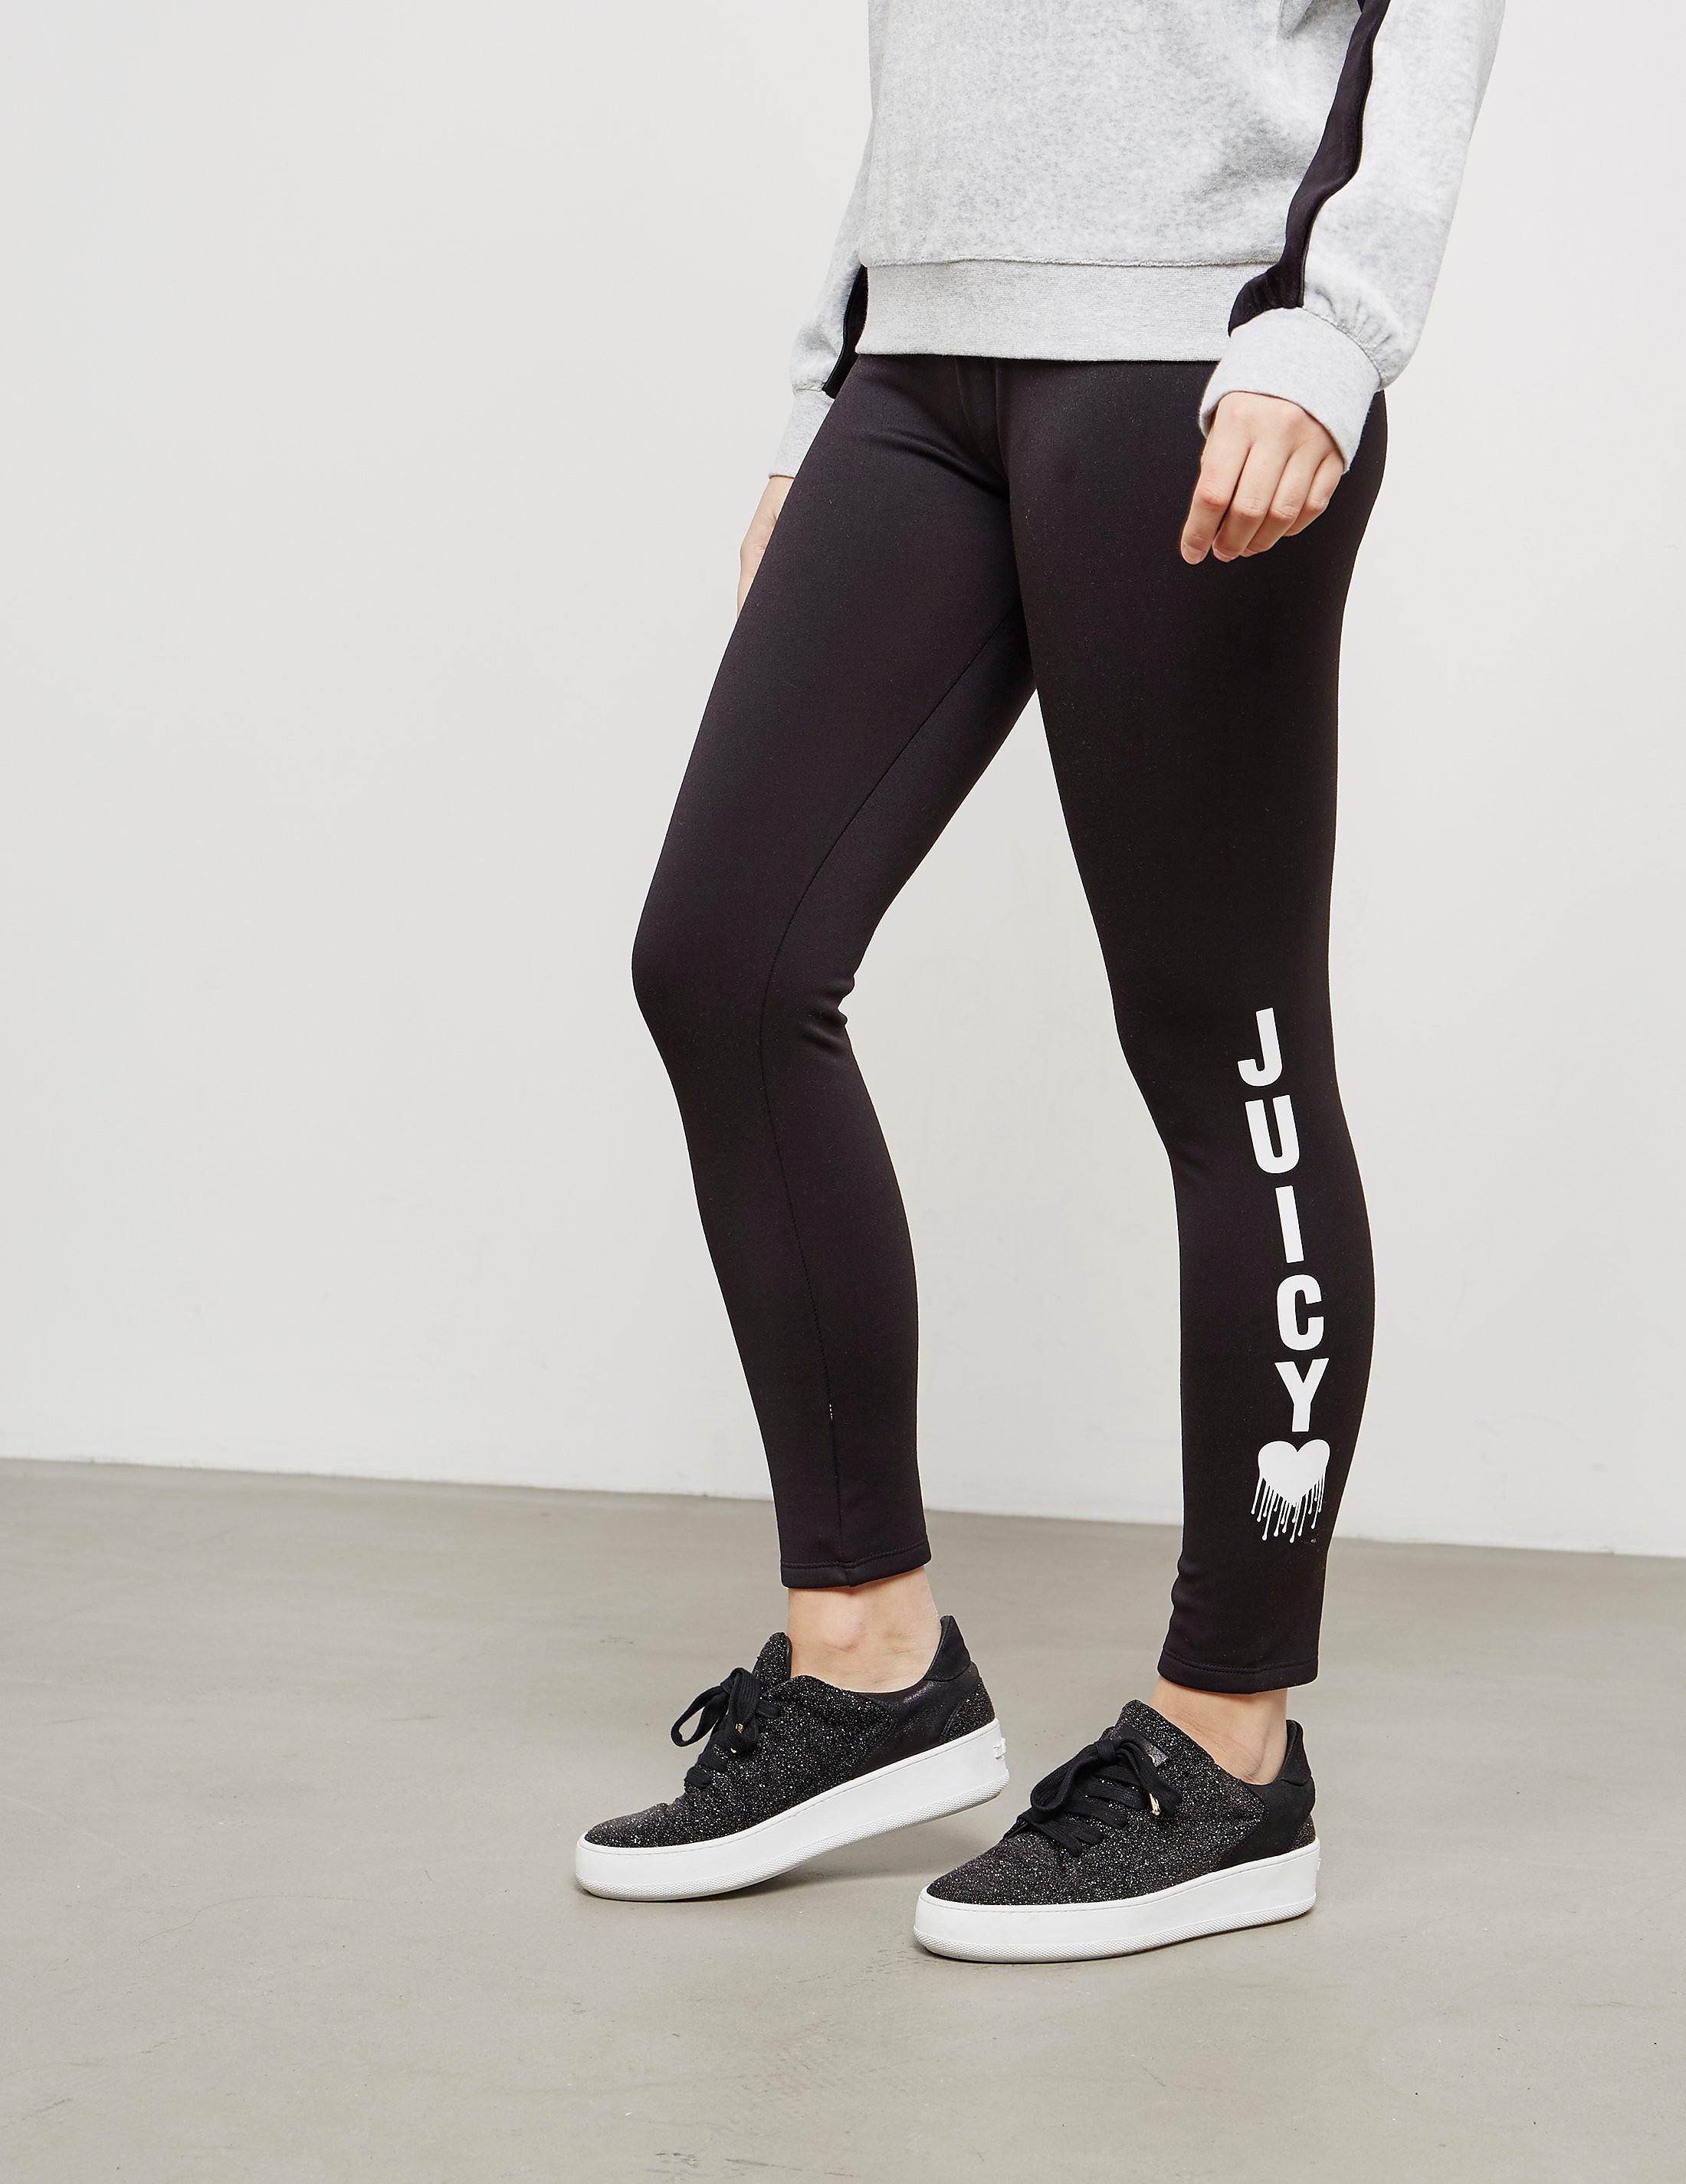 Juicy Couture Heart Leggings